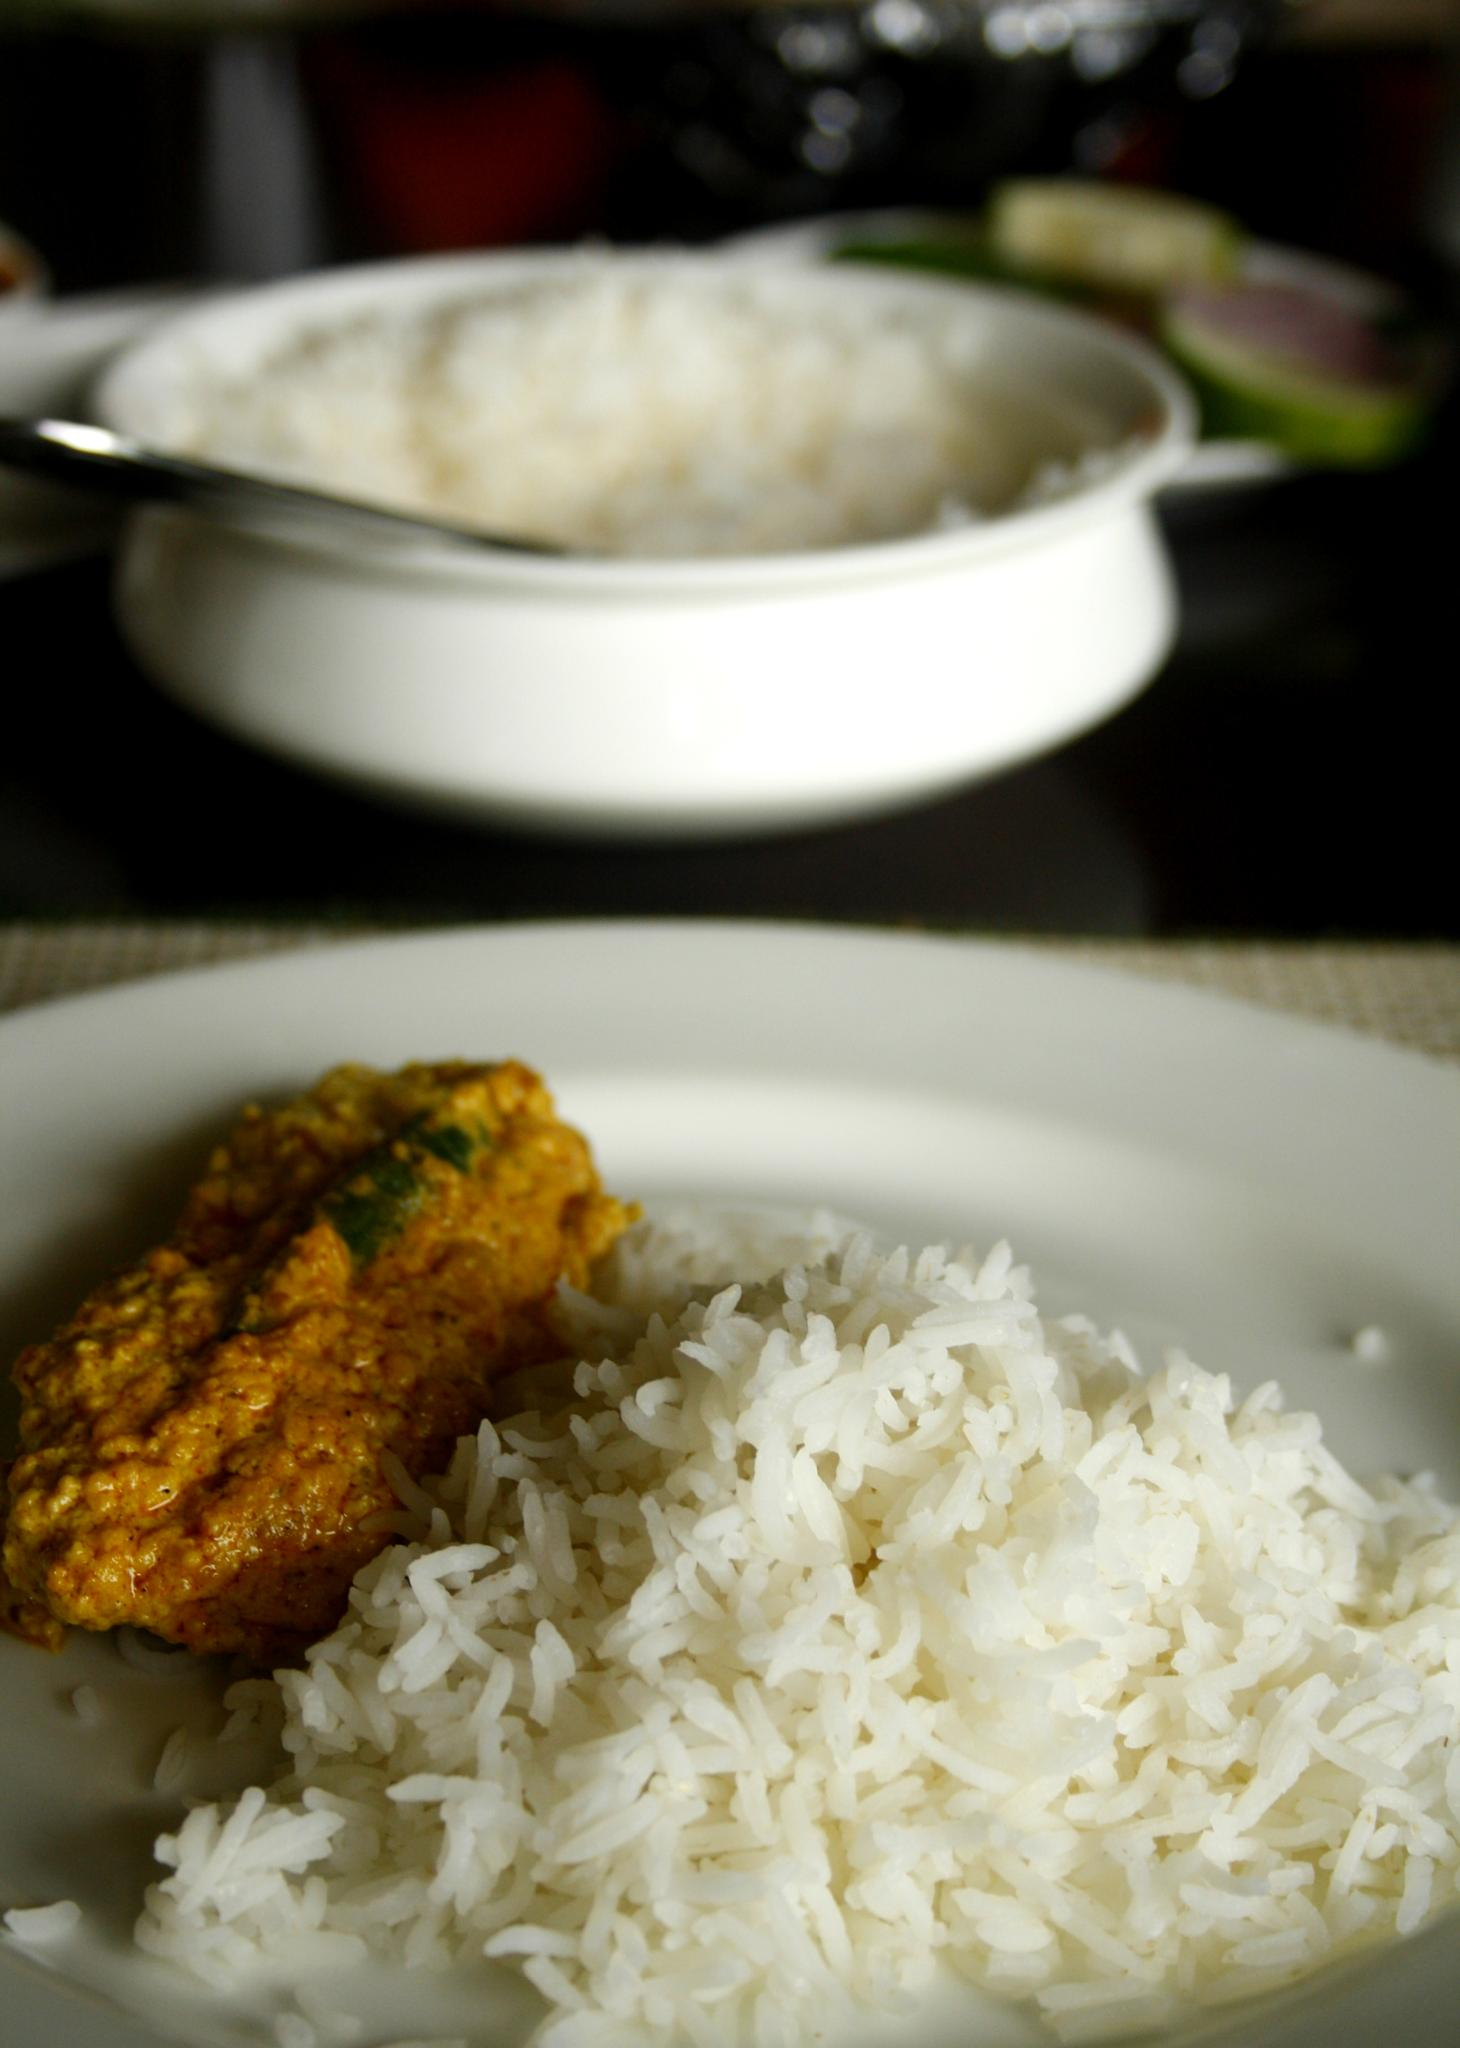 Fish in Mustard Sauce & Rice by Manishabajaj